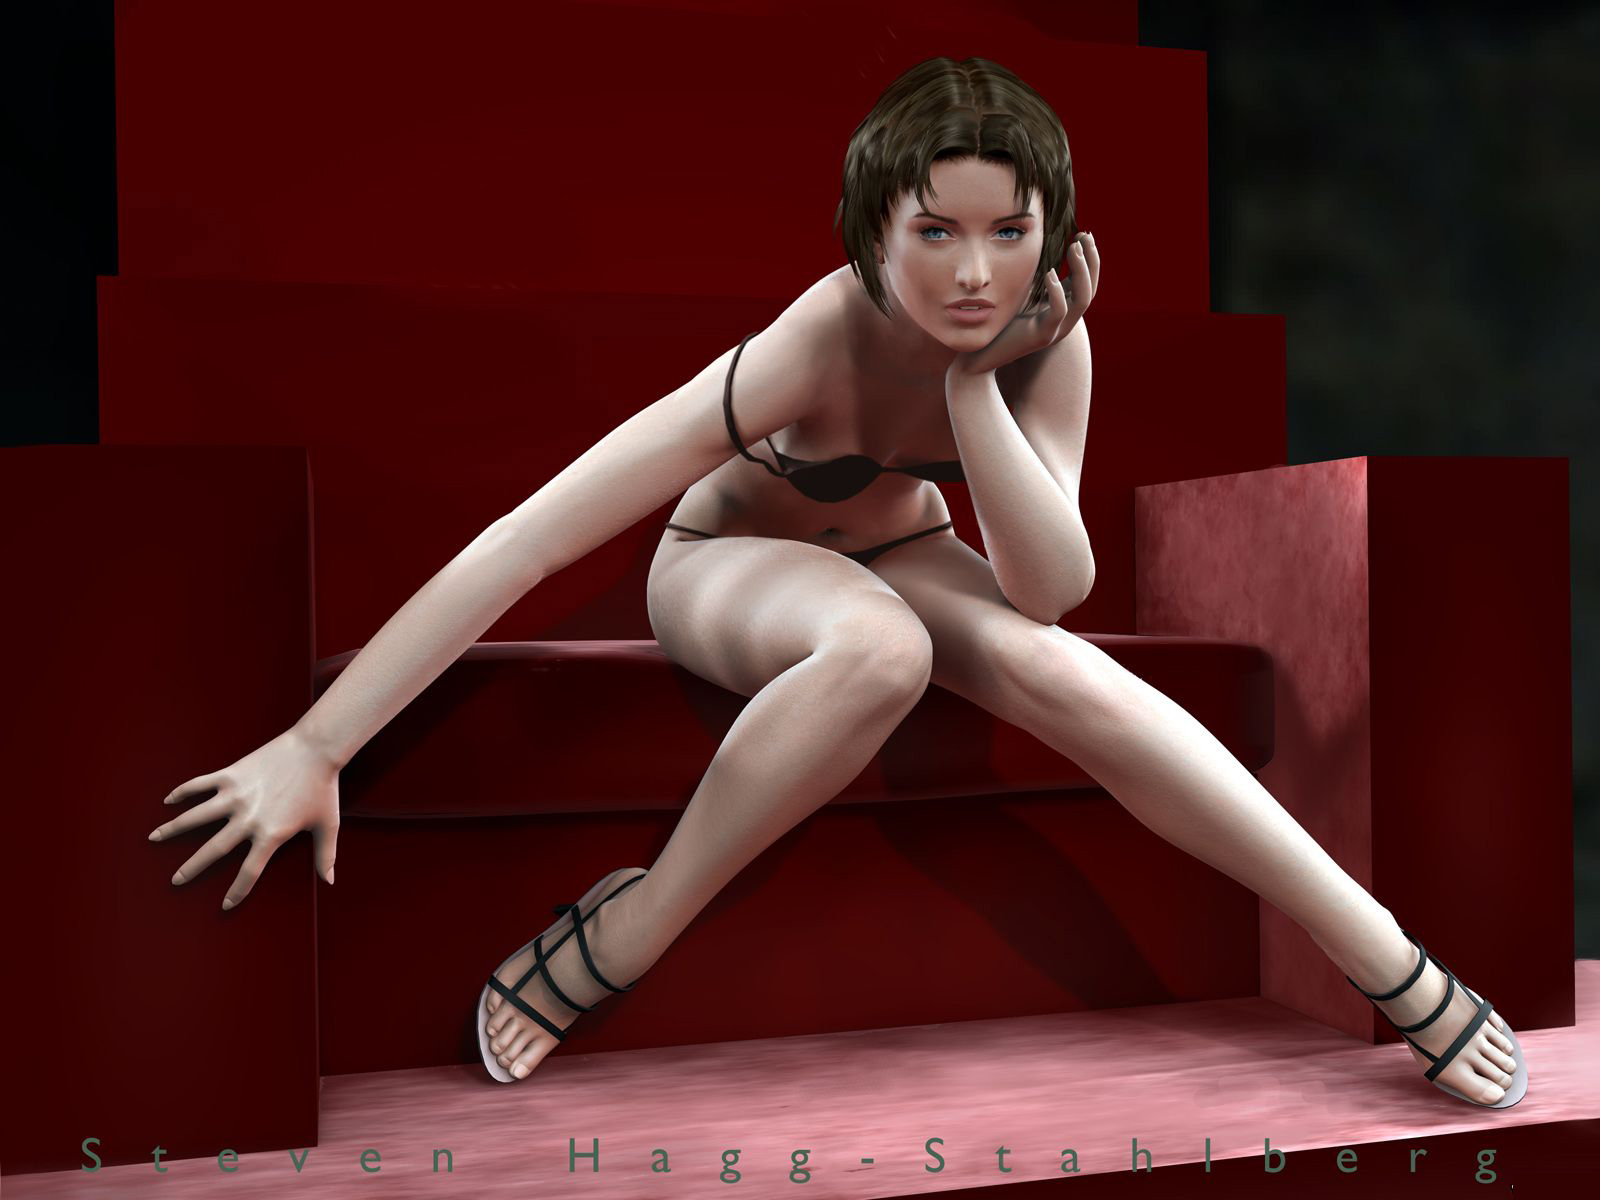 Девушка. Работа в 3D Studio Max. добавил: Админ cкачано: 91 раз.